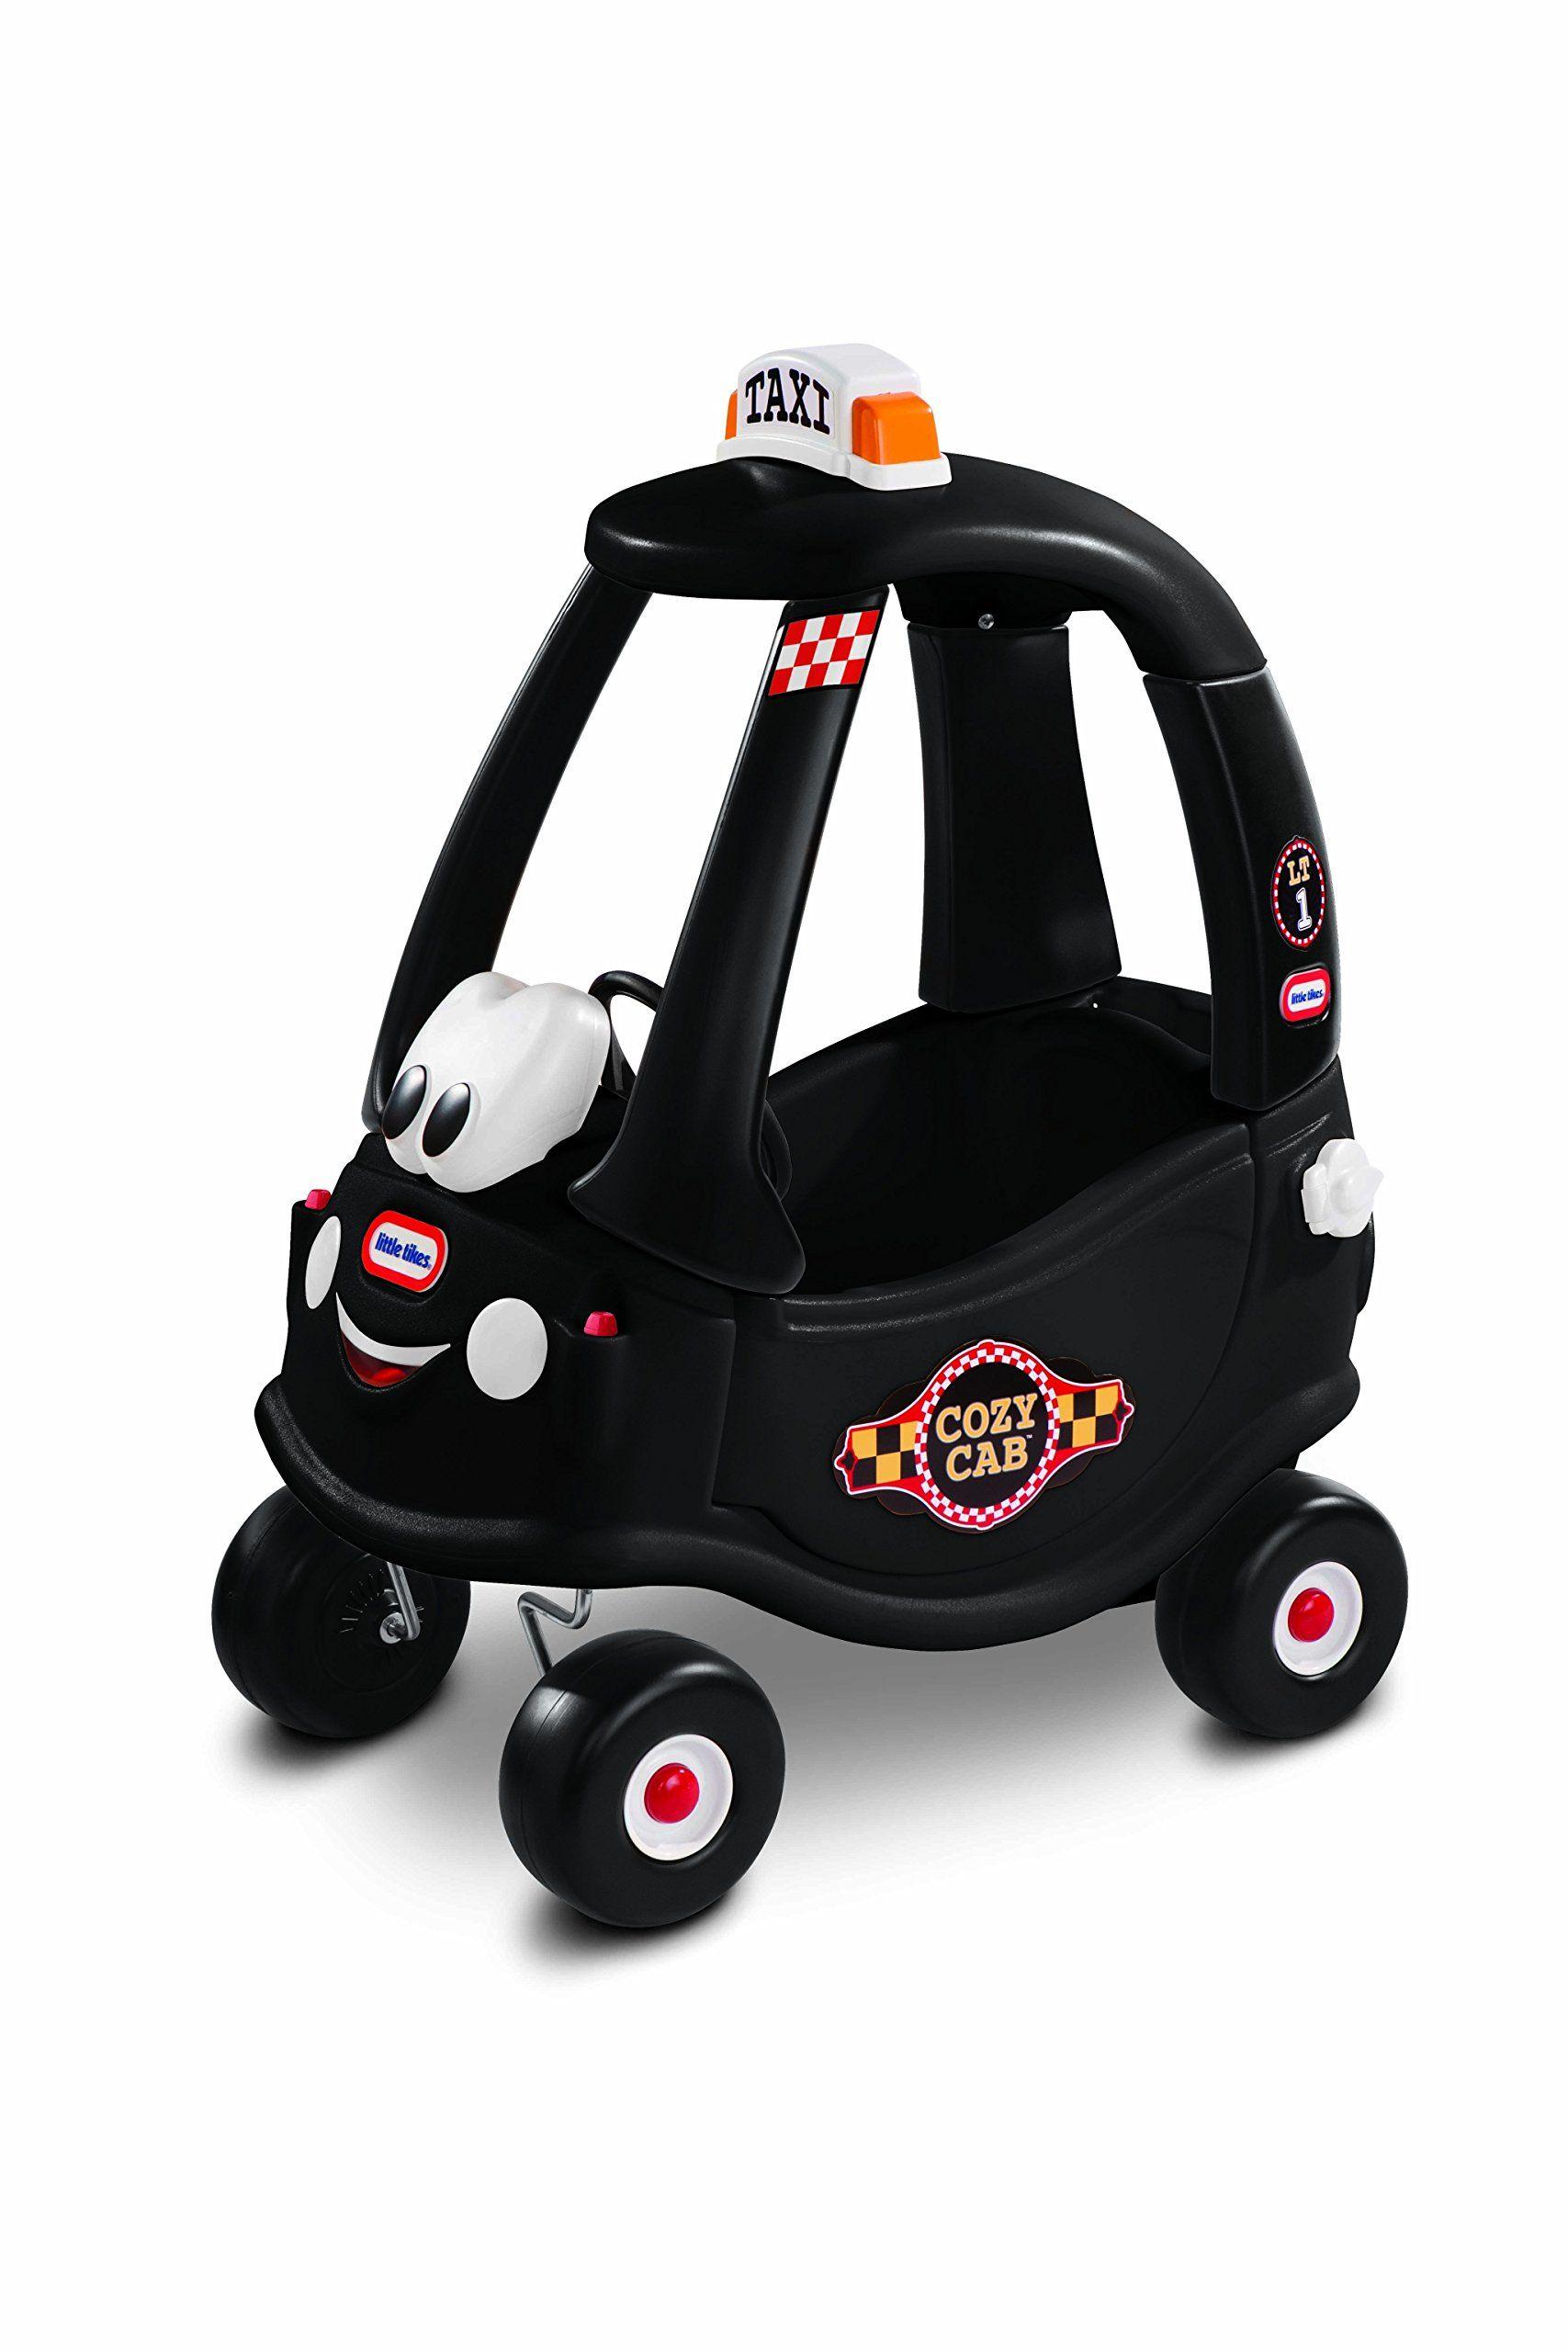 Little Tikes Black Taxi Cozy Coupe Rideon Cozy coupe